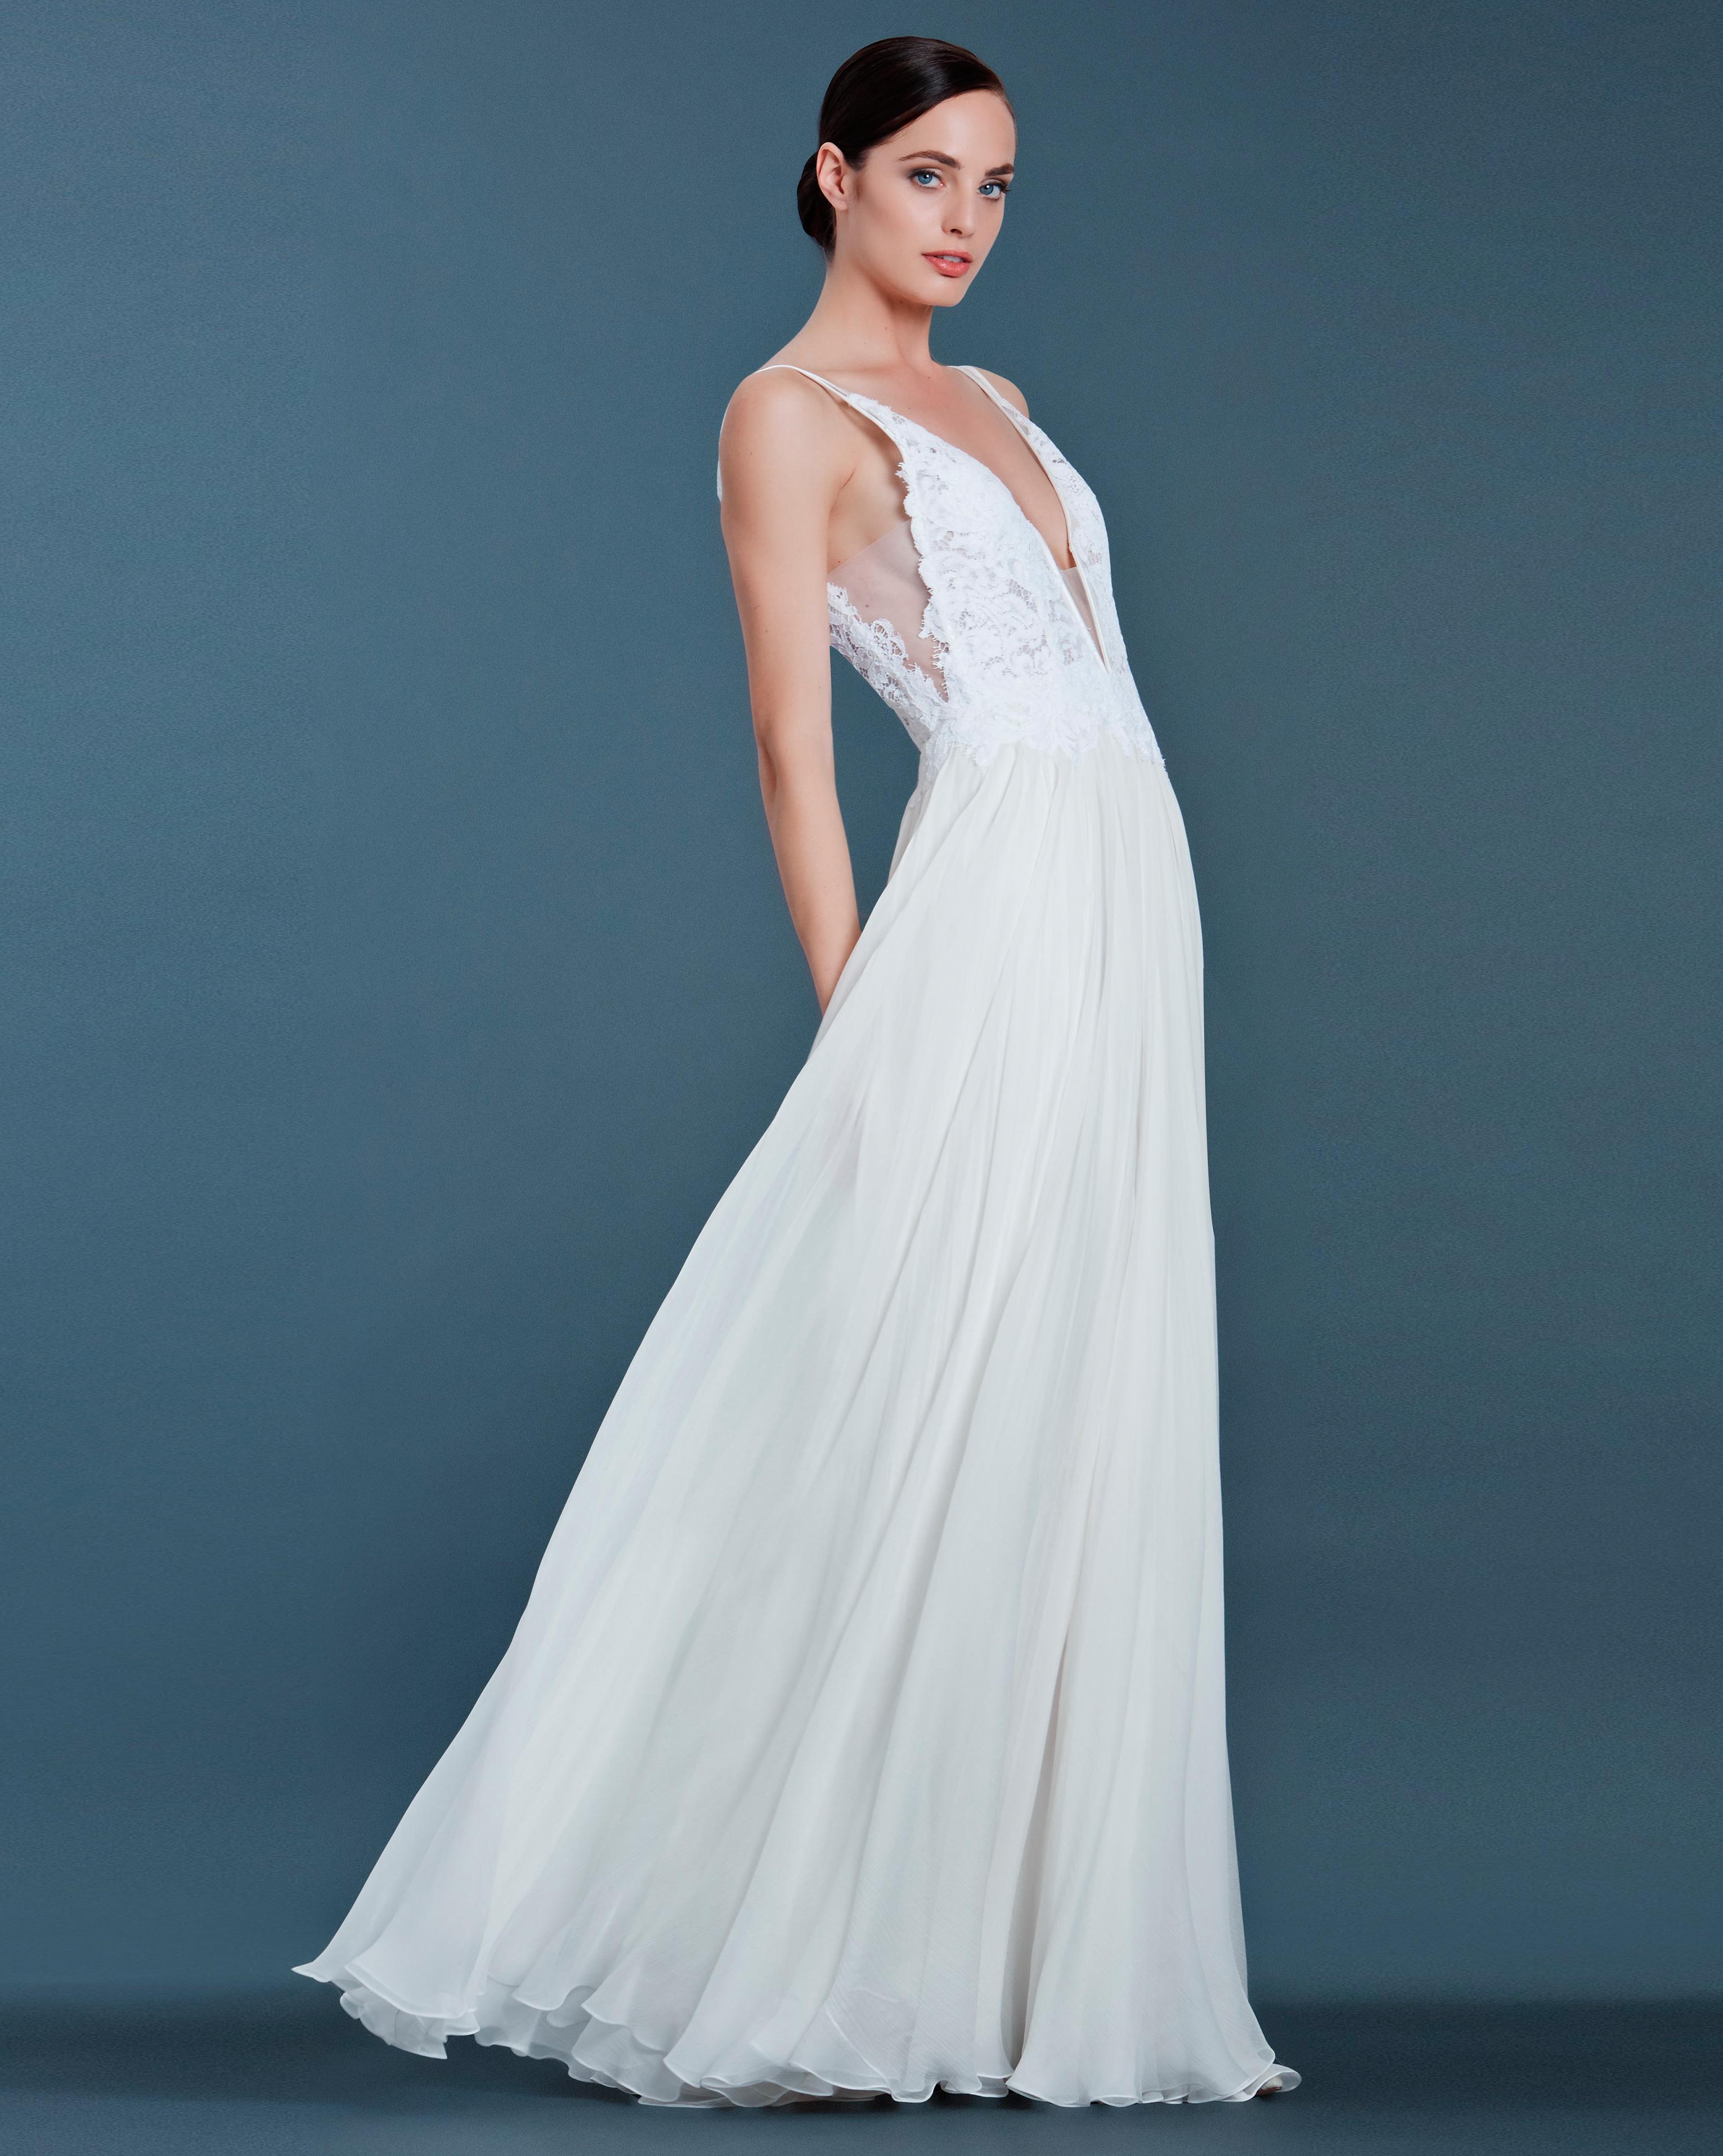 jmendel-fall2016-wedding-dress-4-ophelia.jpg